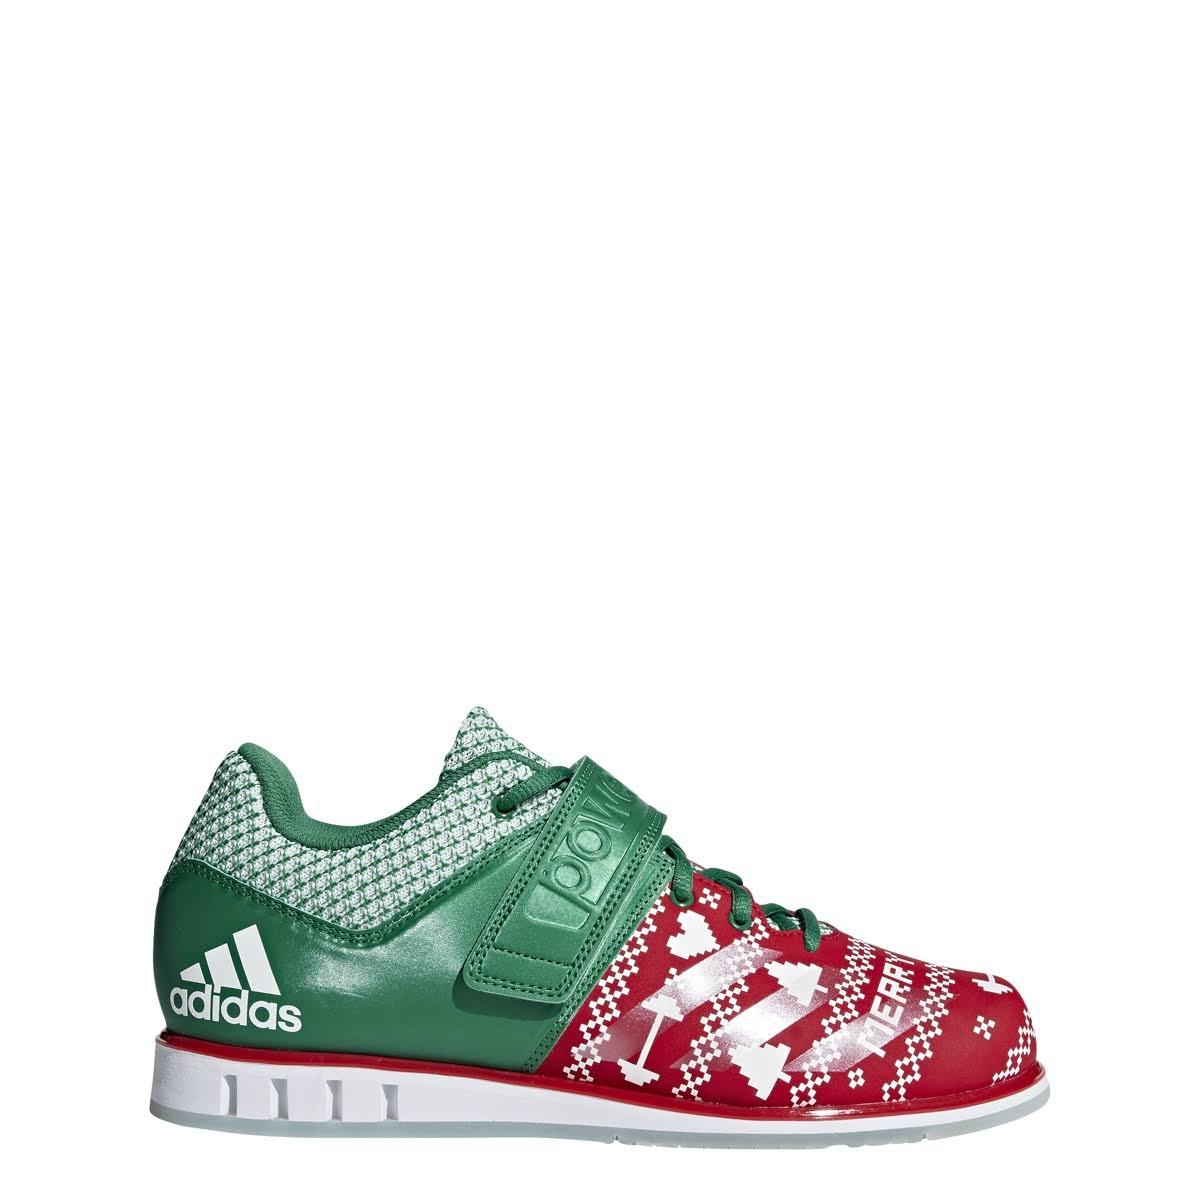 Negrita Adidas Escarlata Verde Rojo 3 Hombre 9 Blanco Nube Zapatillas 1 Powerlift ZwHqxdzz4